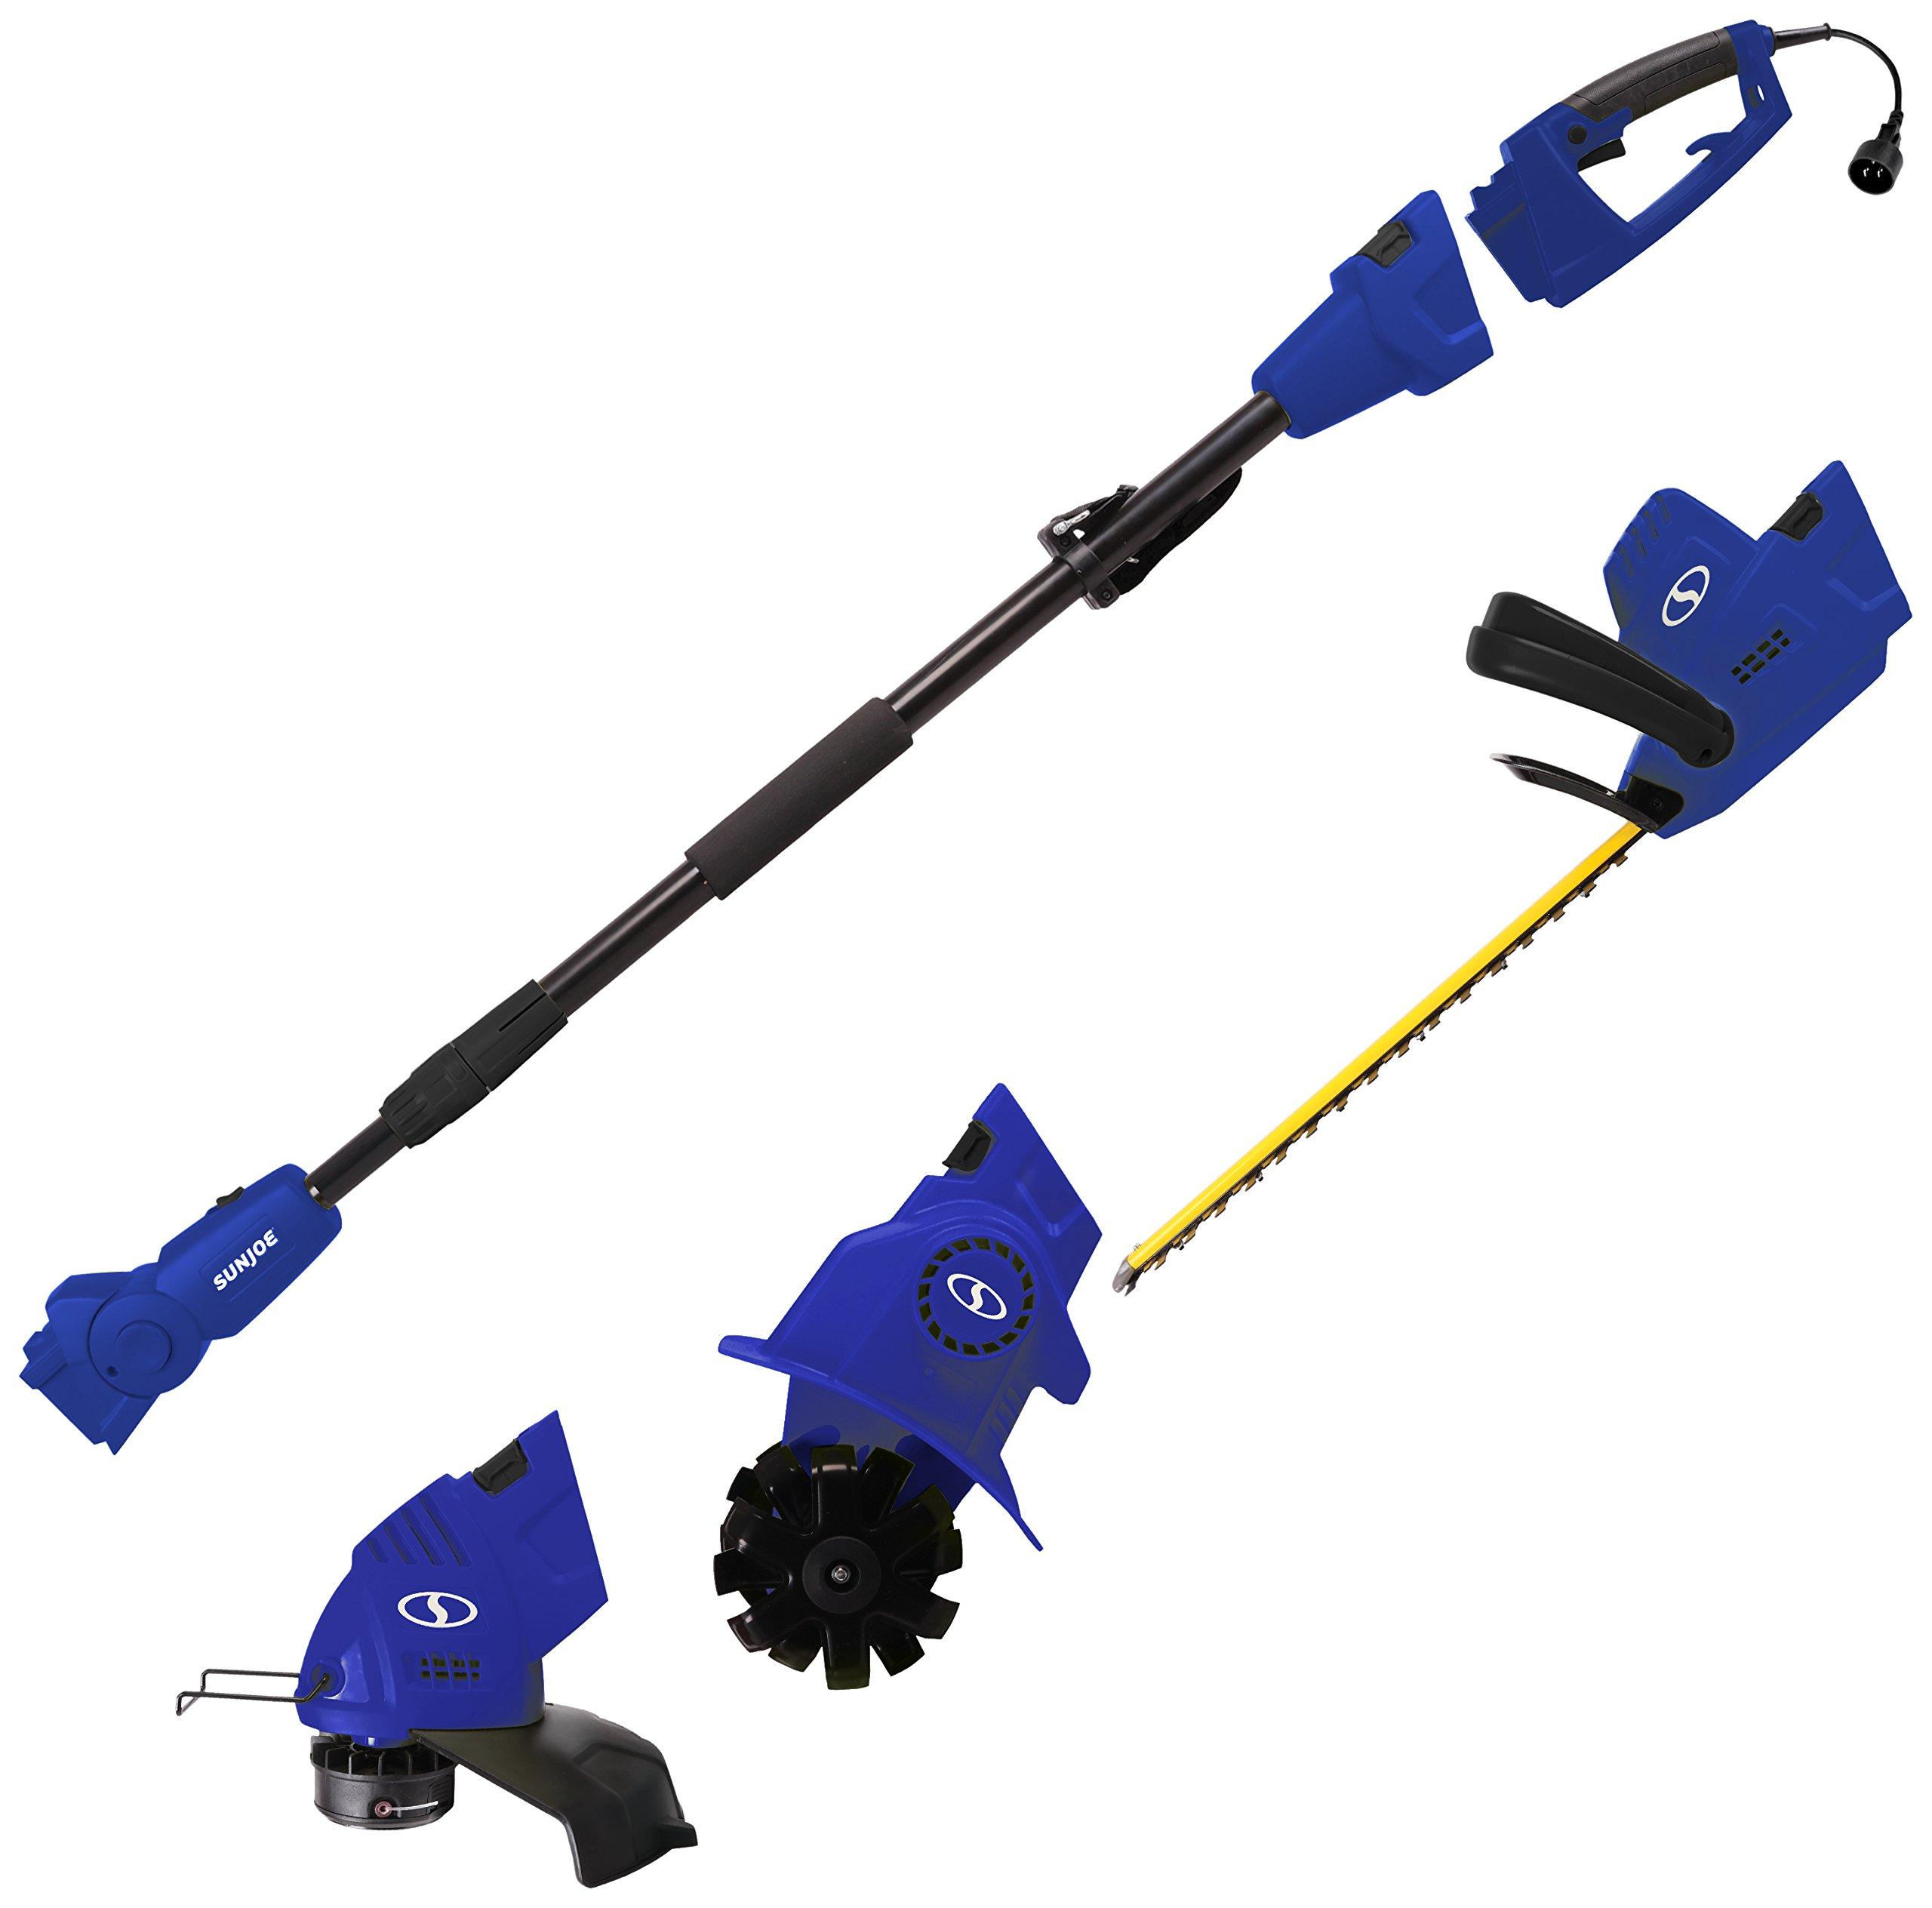 Sun Joe GTS4000E-SJB Lawn + Garden Multi-Tool Care System, Blue